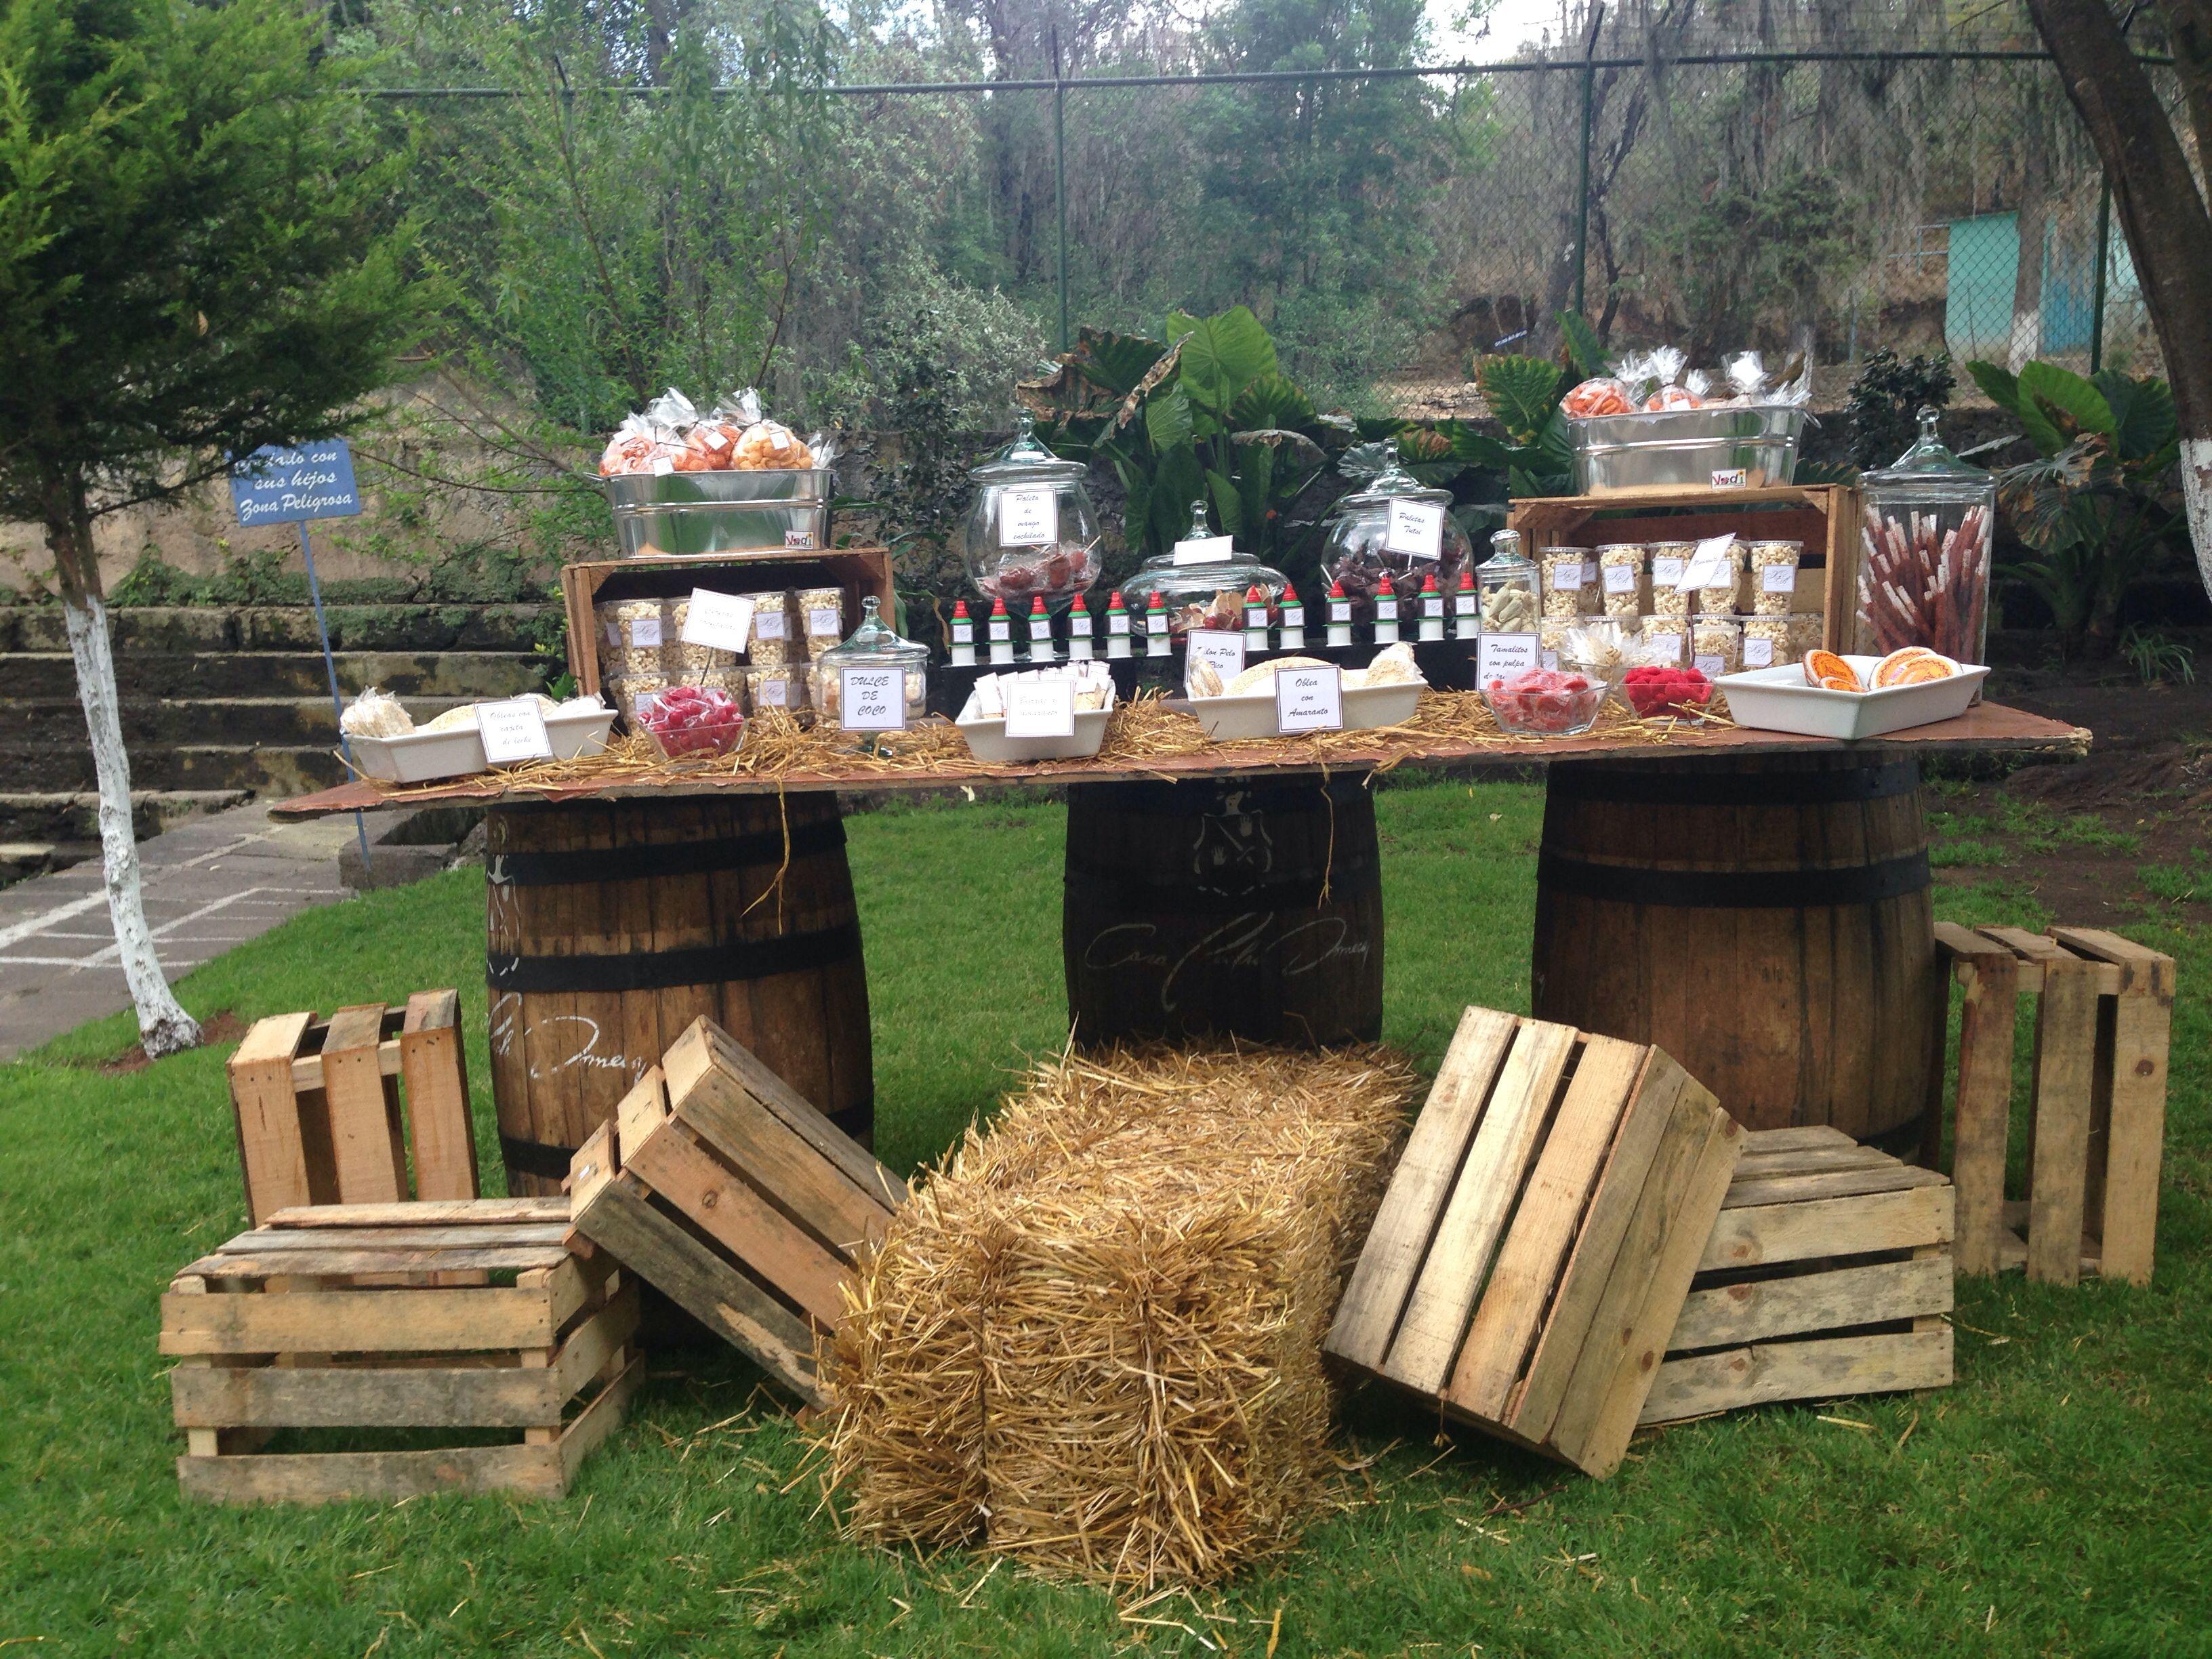 Mesa de dulces vintage wedding planner weddingp anner for Fotos de bares de madera